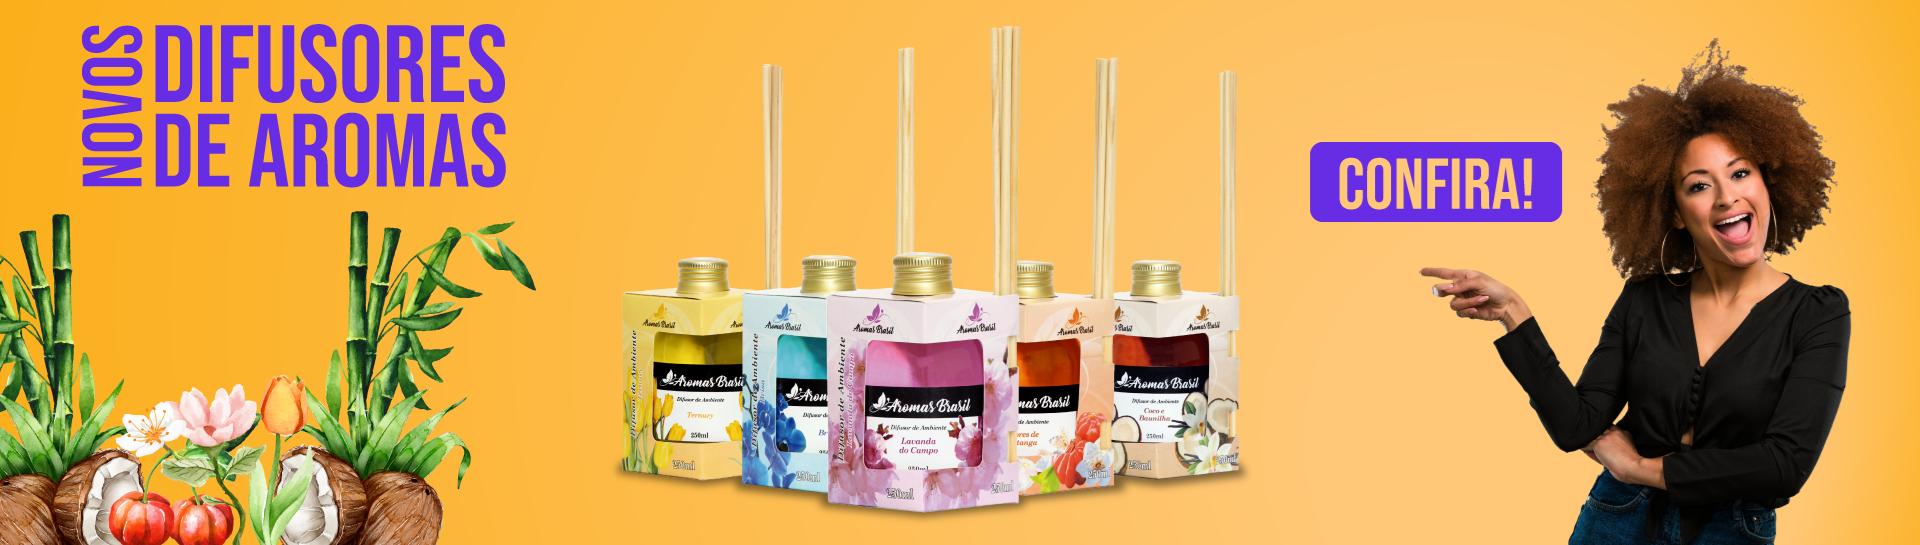 Difusores Novos Aromas